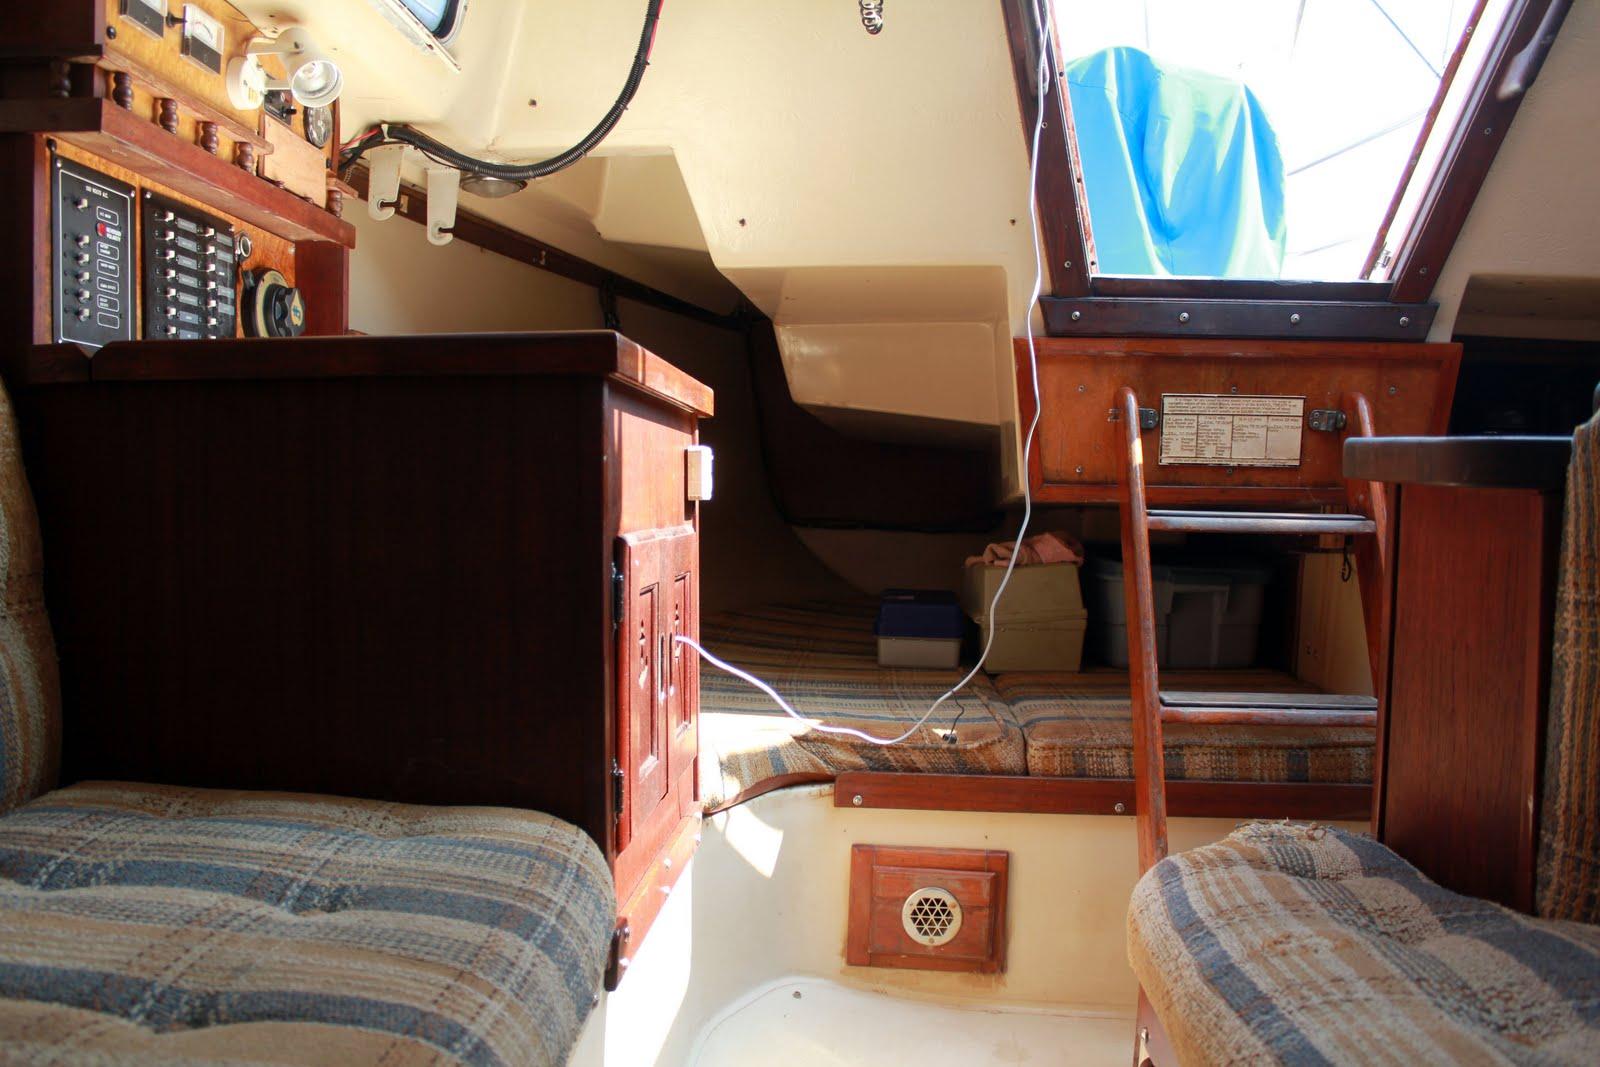 Bluebird Wanderlodge Motorhome Interior further Img likewise Canadian National Railway Diesel Lo otive Dash Cw C W also Ns Czmdnpqm moreover Kiacarnival Sedonalwb. on original diesel engine